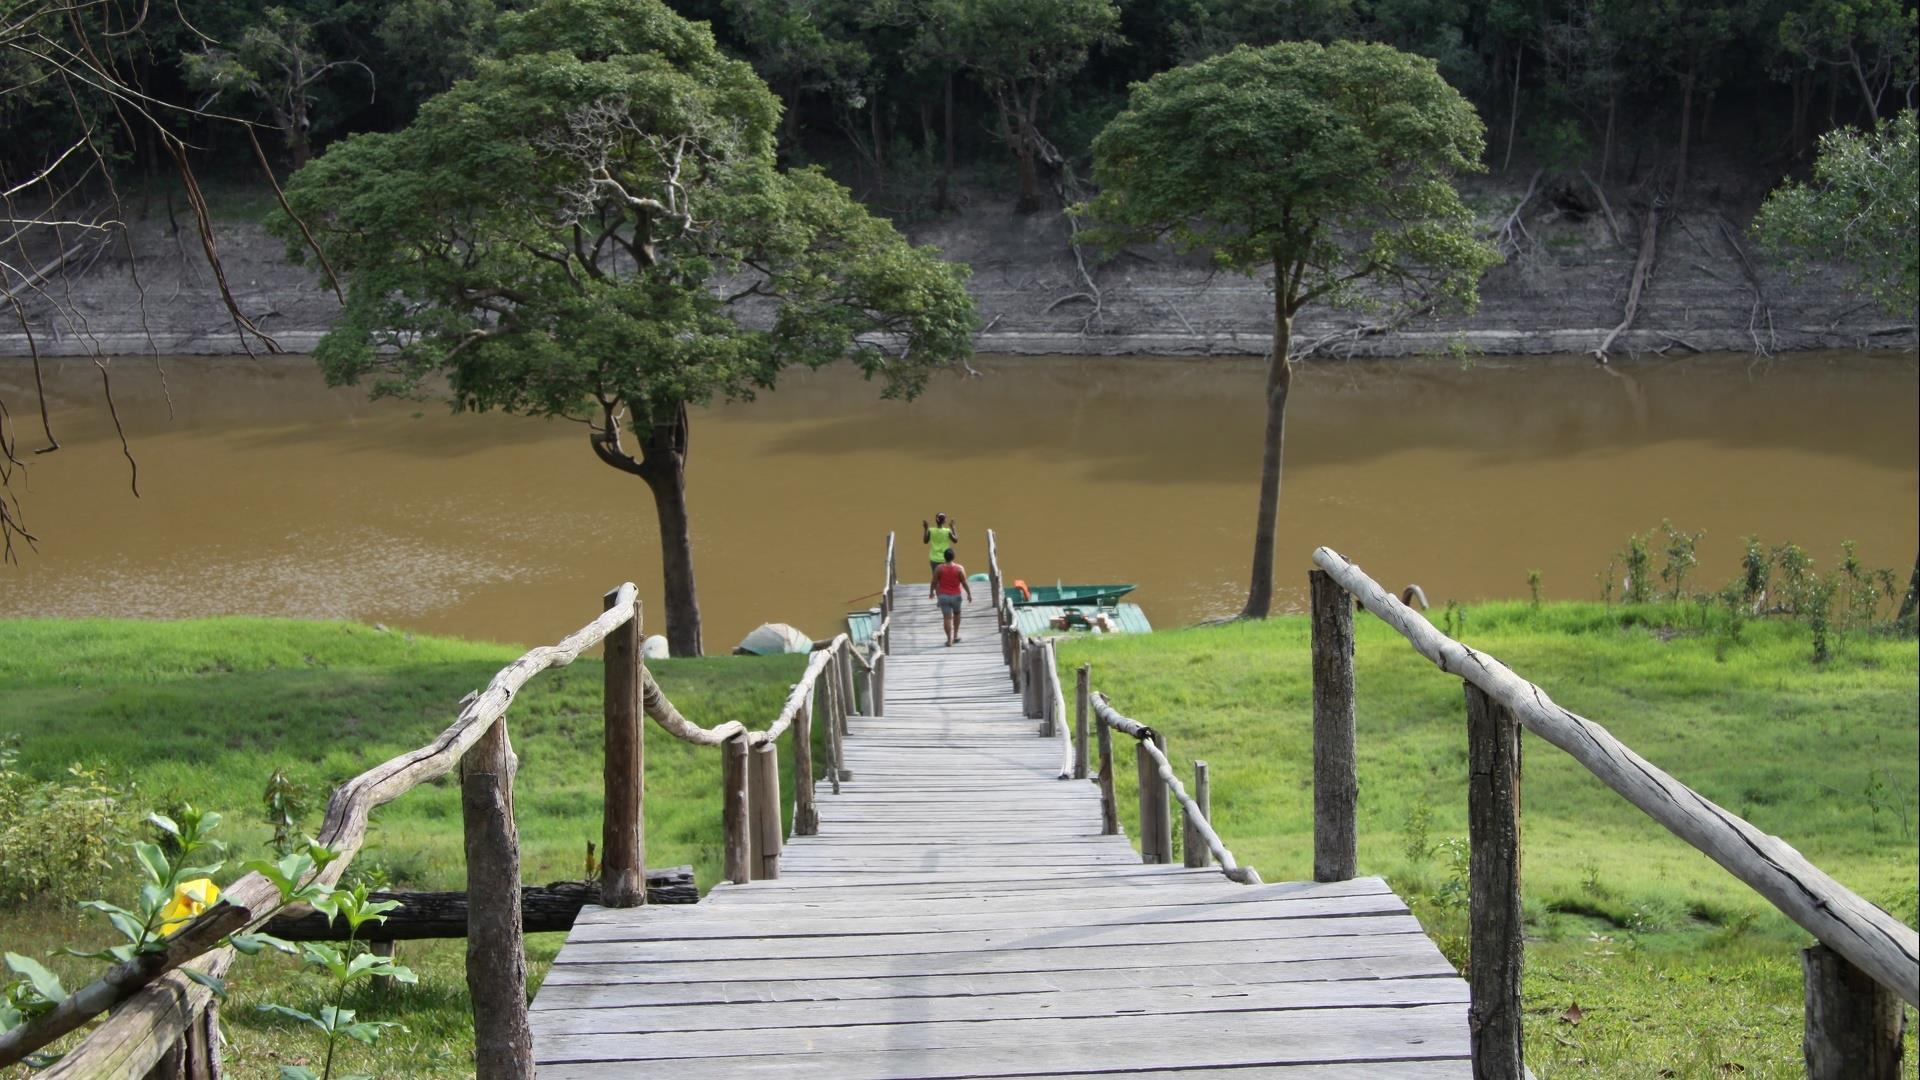 Brasilien Amazonas: 4 Tage Reisebaustein - Tupana Lodge Cigana Paket